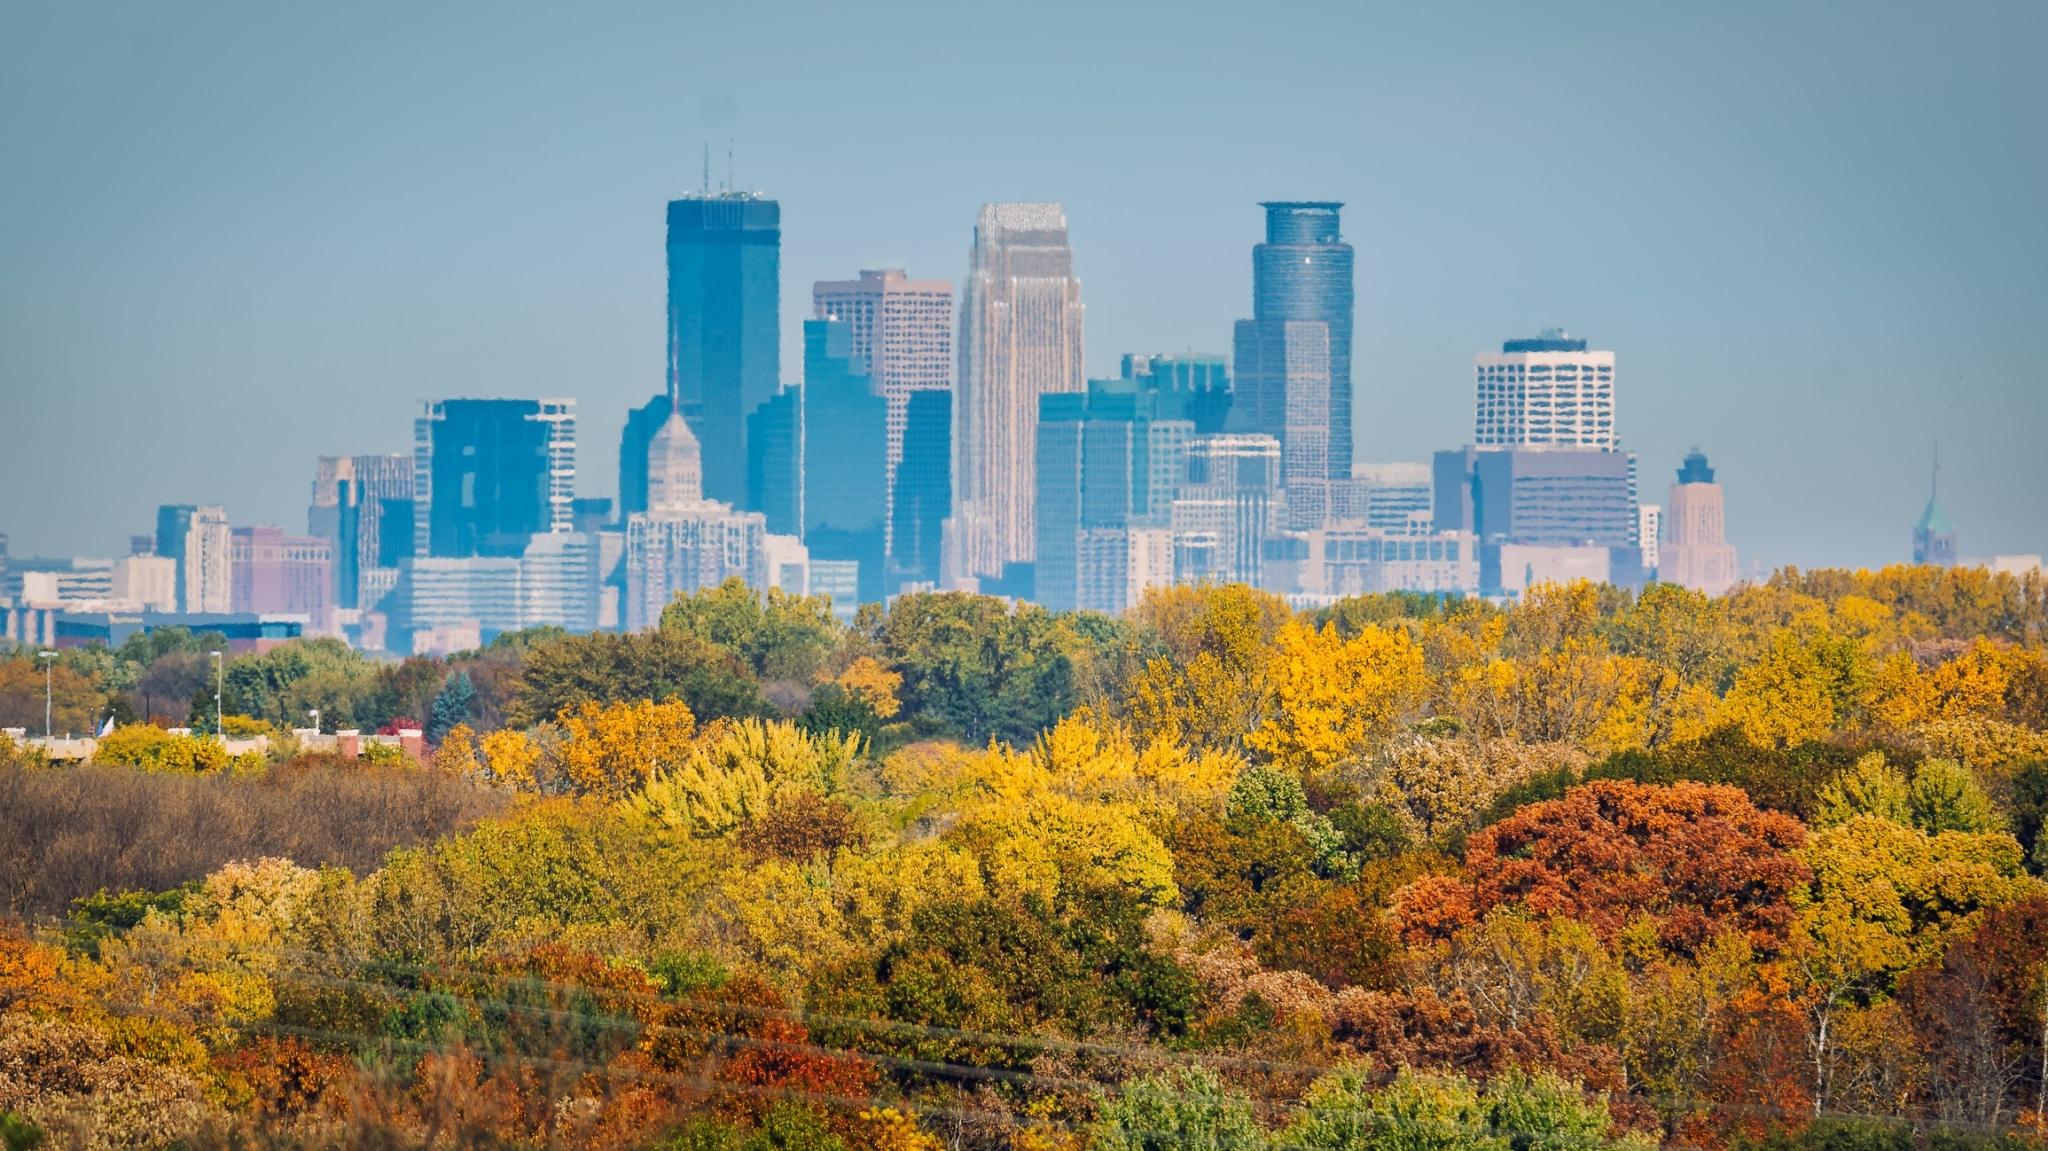 Minneapolis skyline during fall